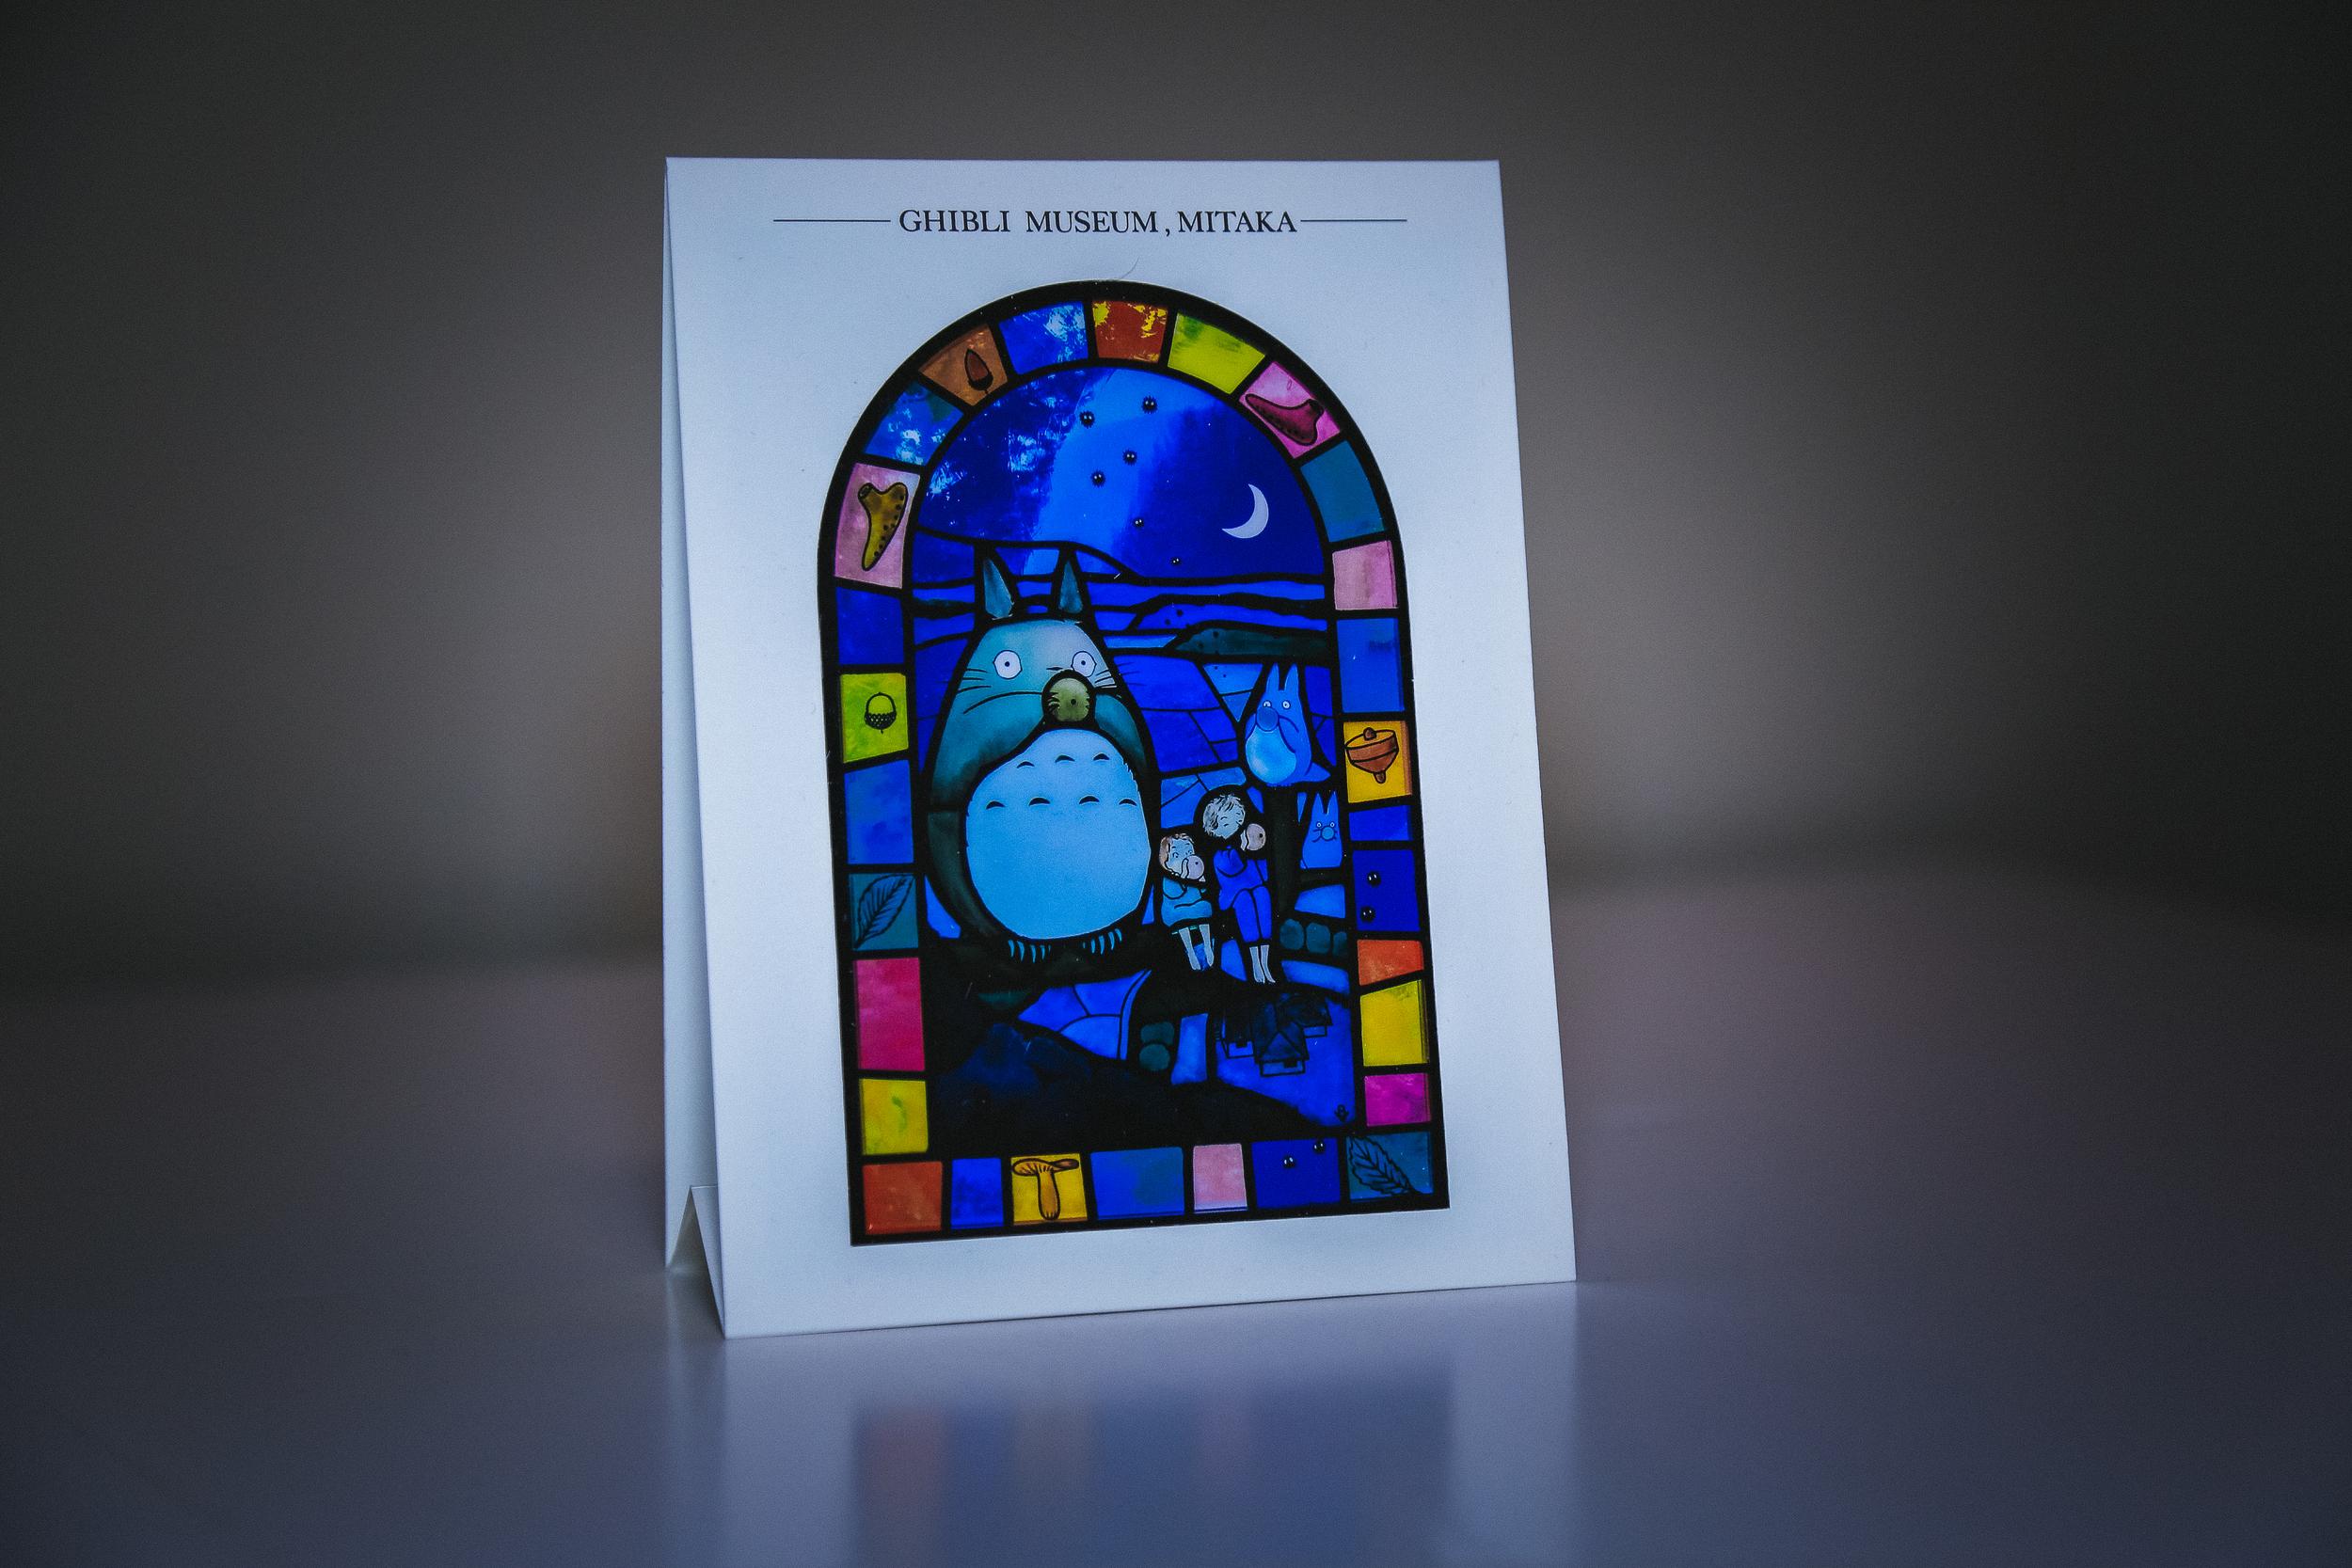 Studio Ghibli Museum Gift Shop - Stain Glass Postcard -Eric Bravo Photography